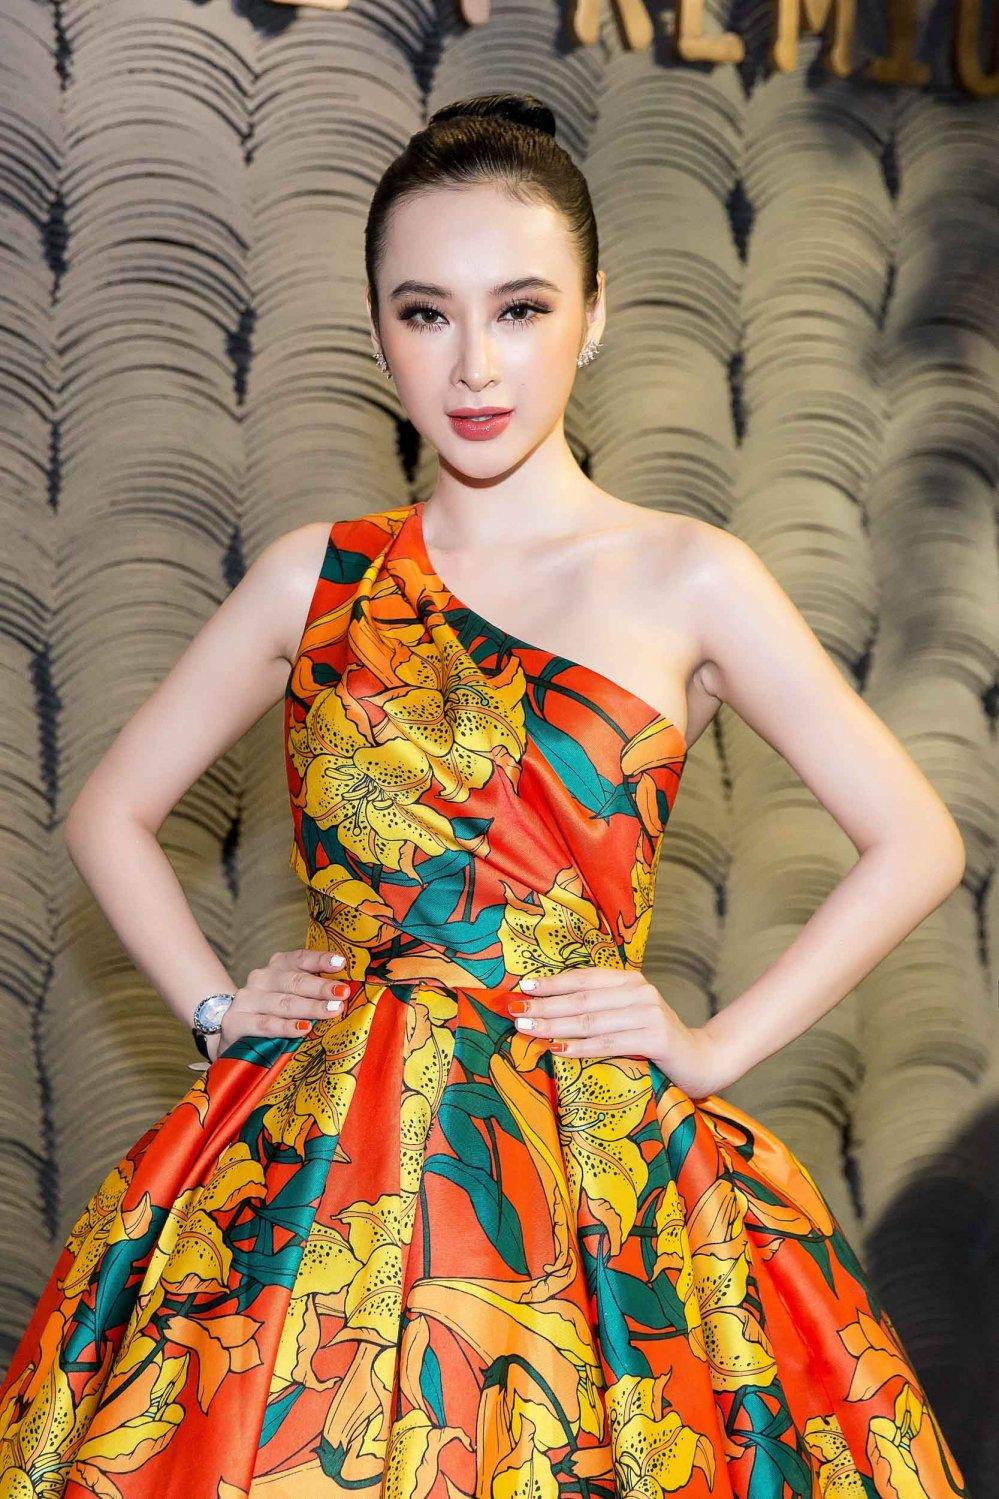 Angela Phuong Trinh kieu sa khoe vai thon hinh anh 8